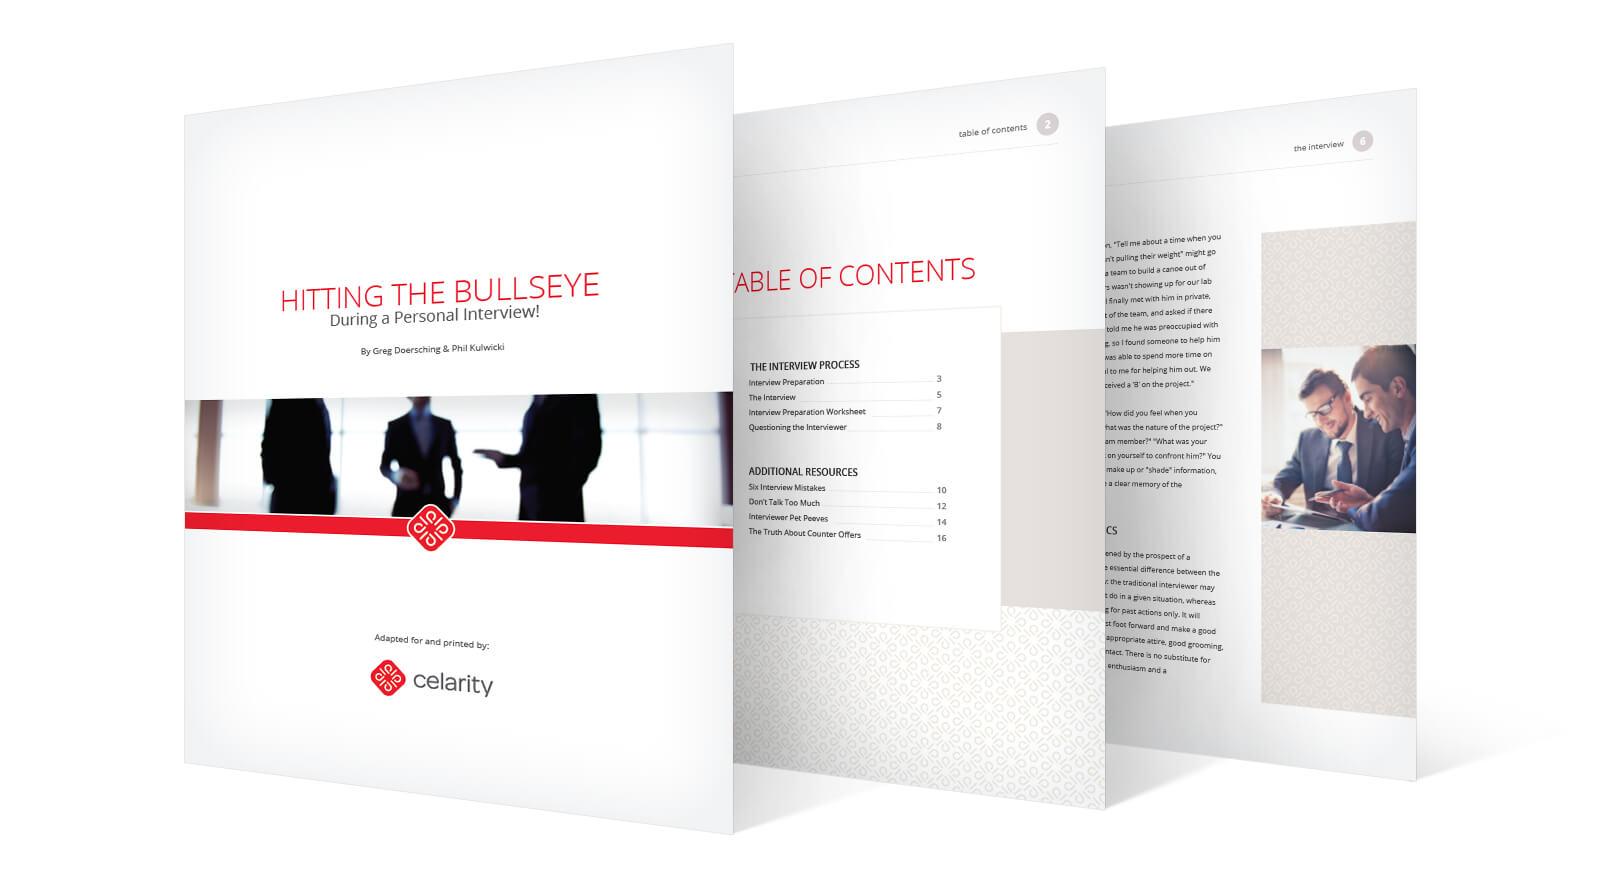 Celarity - Print Design